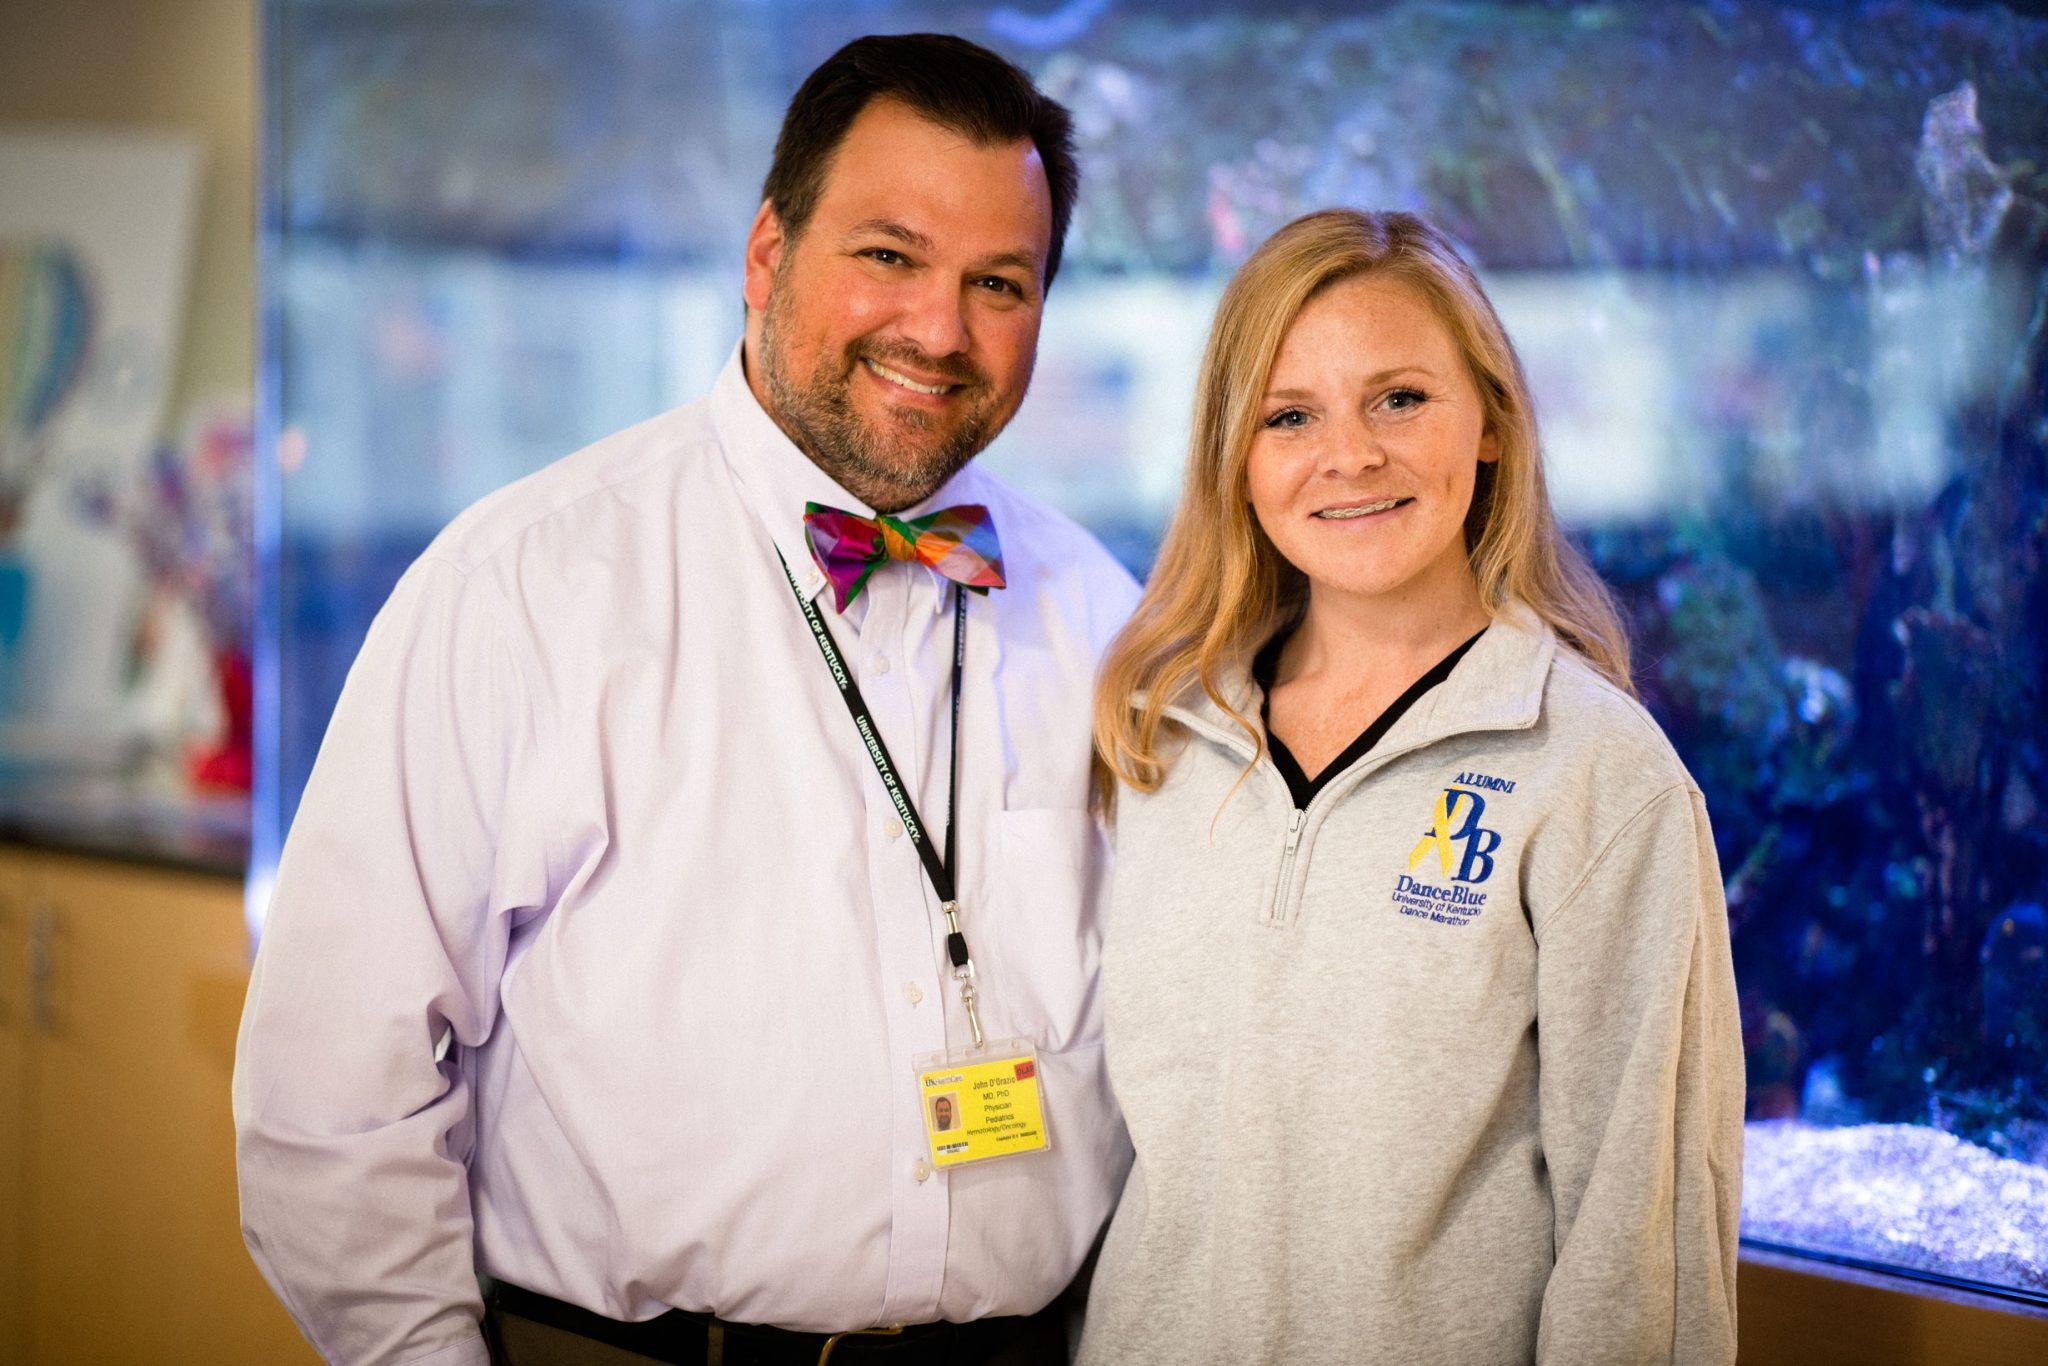 Dr. John D'Orazio with Christa at the DanceBlue clinic, where she volunteered.